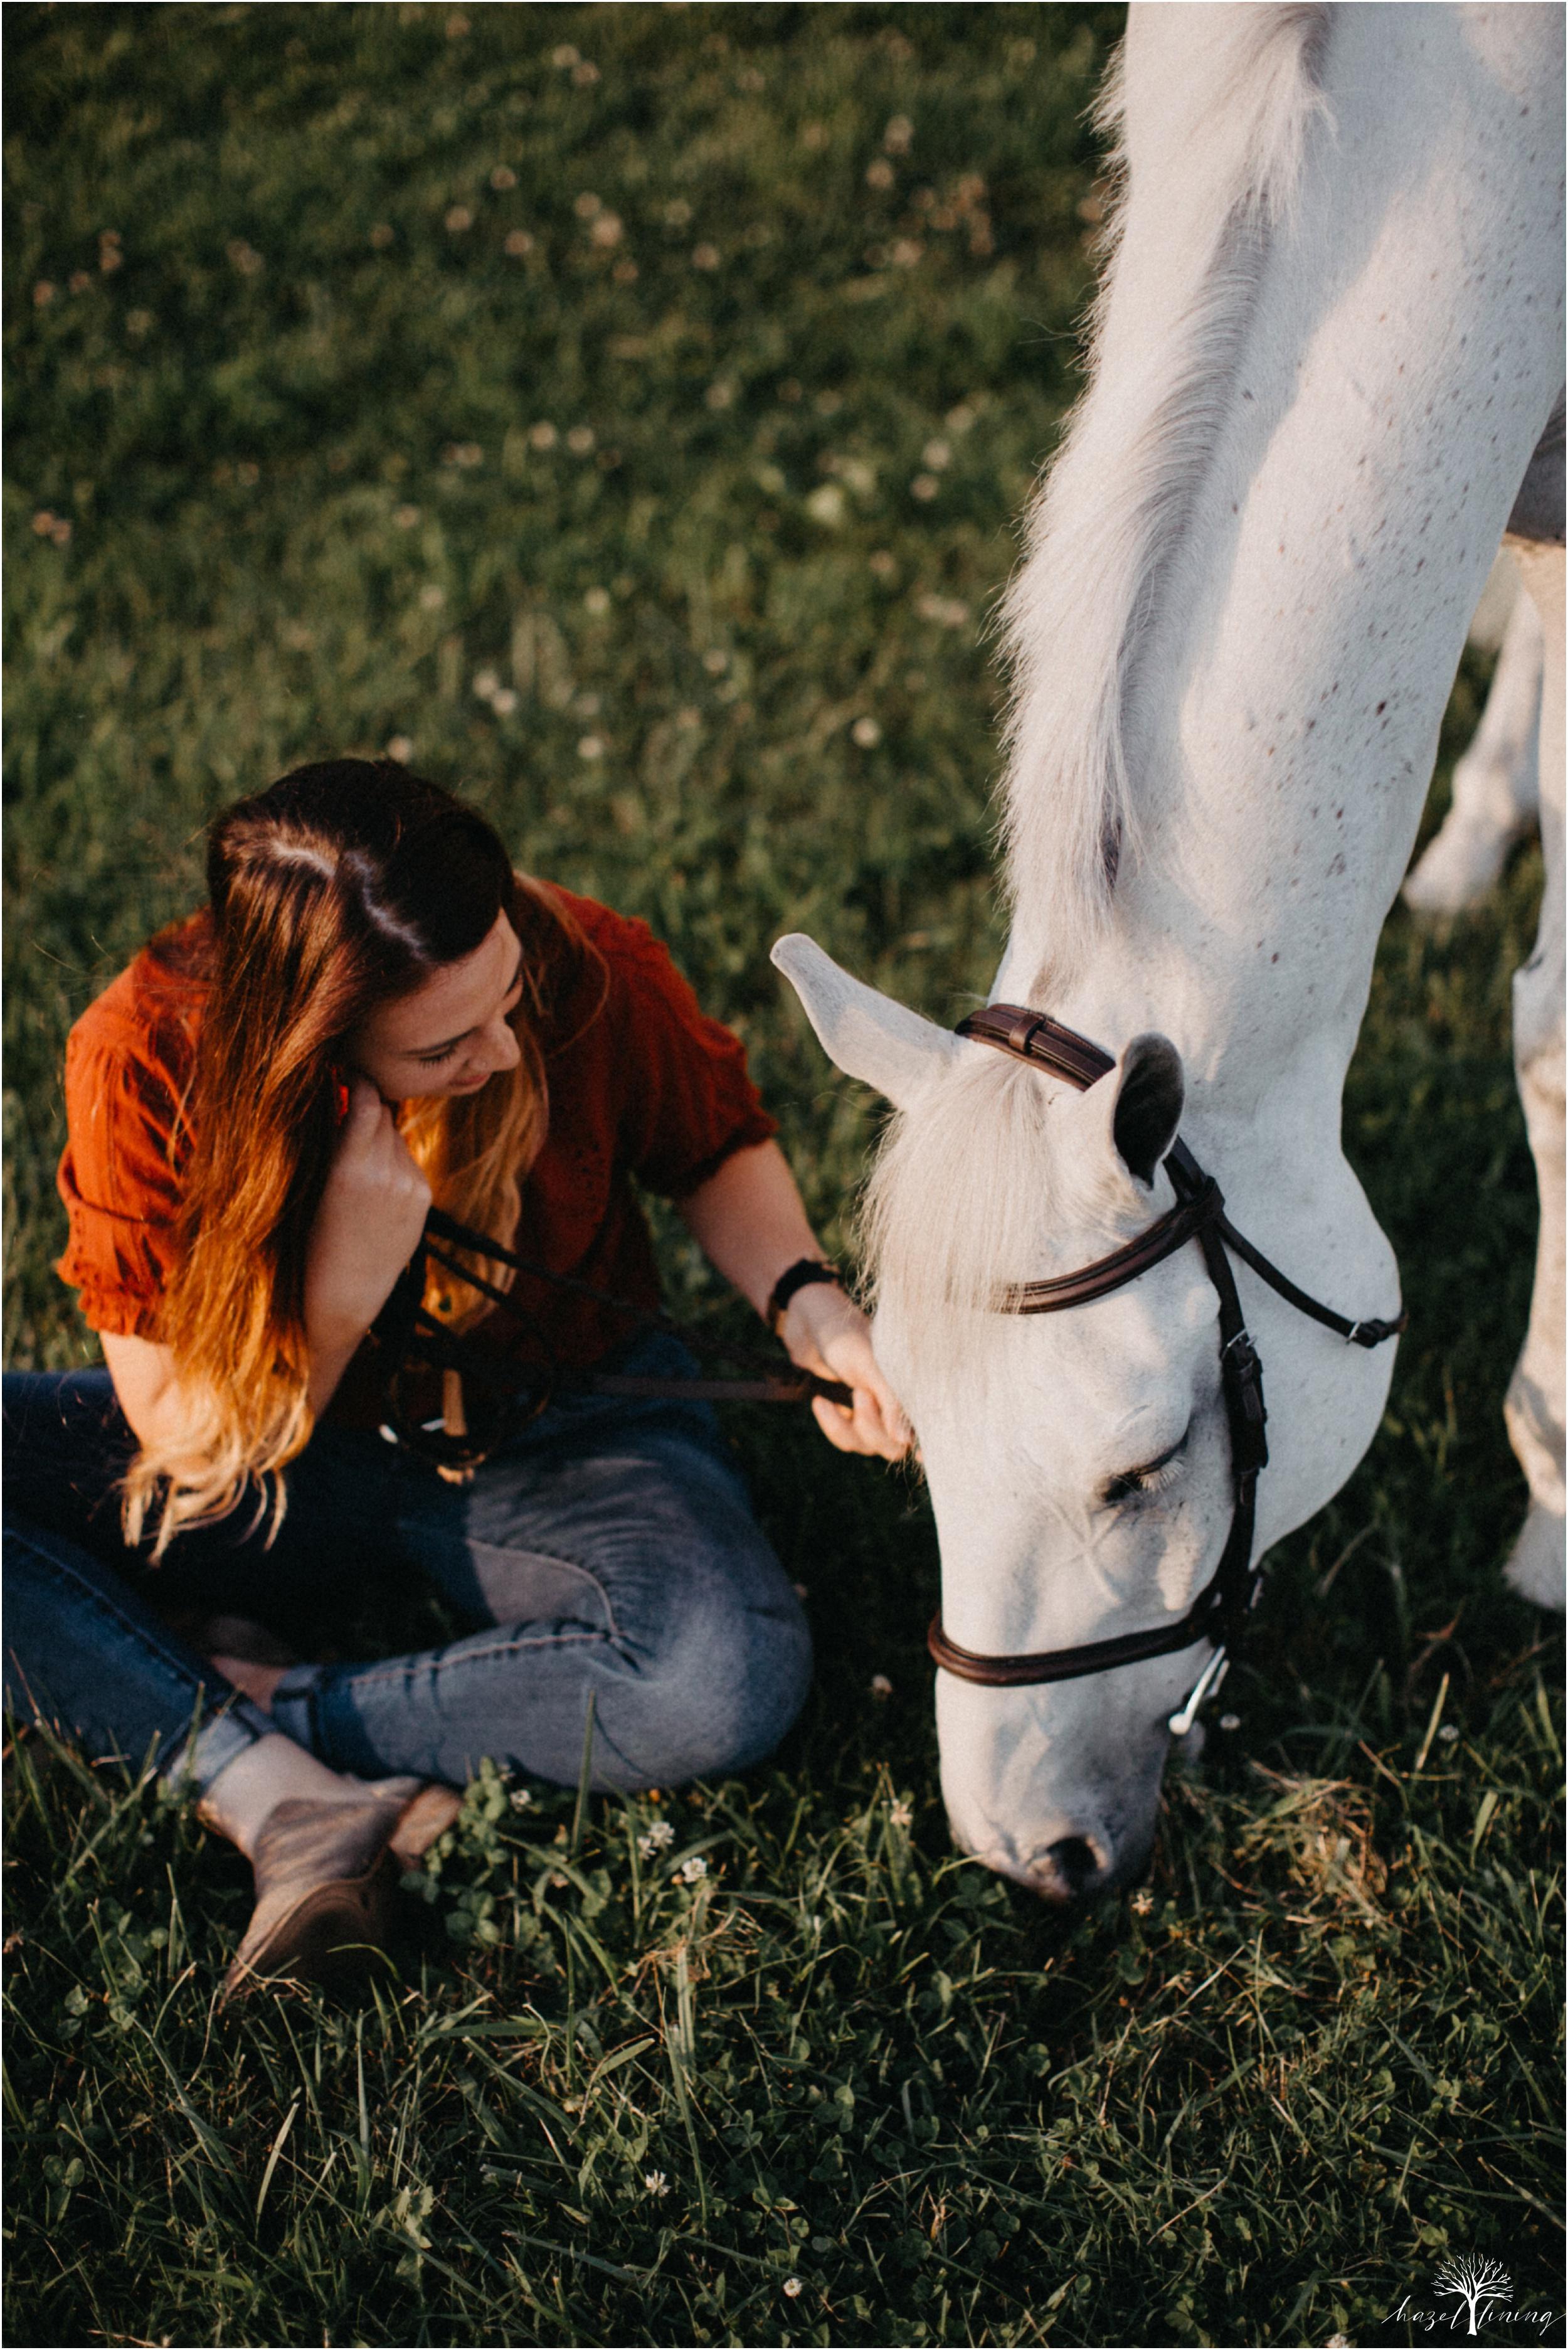 taylor-adams-and-horse-delaware-valley-university-delval-summer-equestrian-portrait-session-hazel-lining-photography-destination-elopement-wedding-engagement-photography_0021.jpg